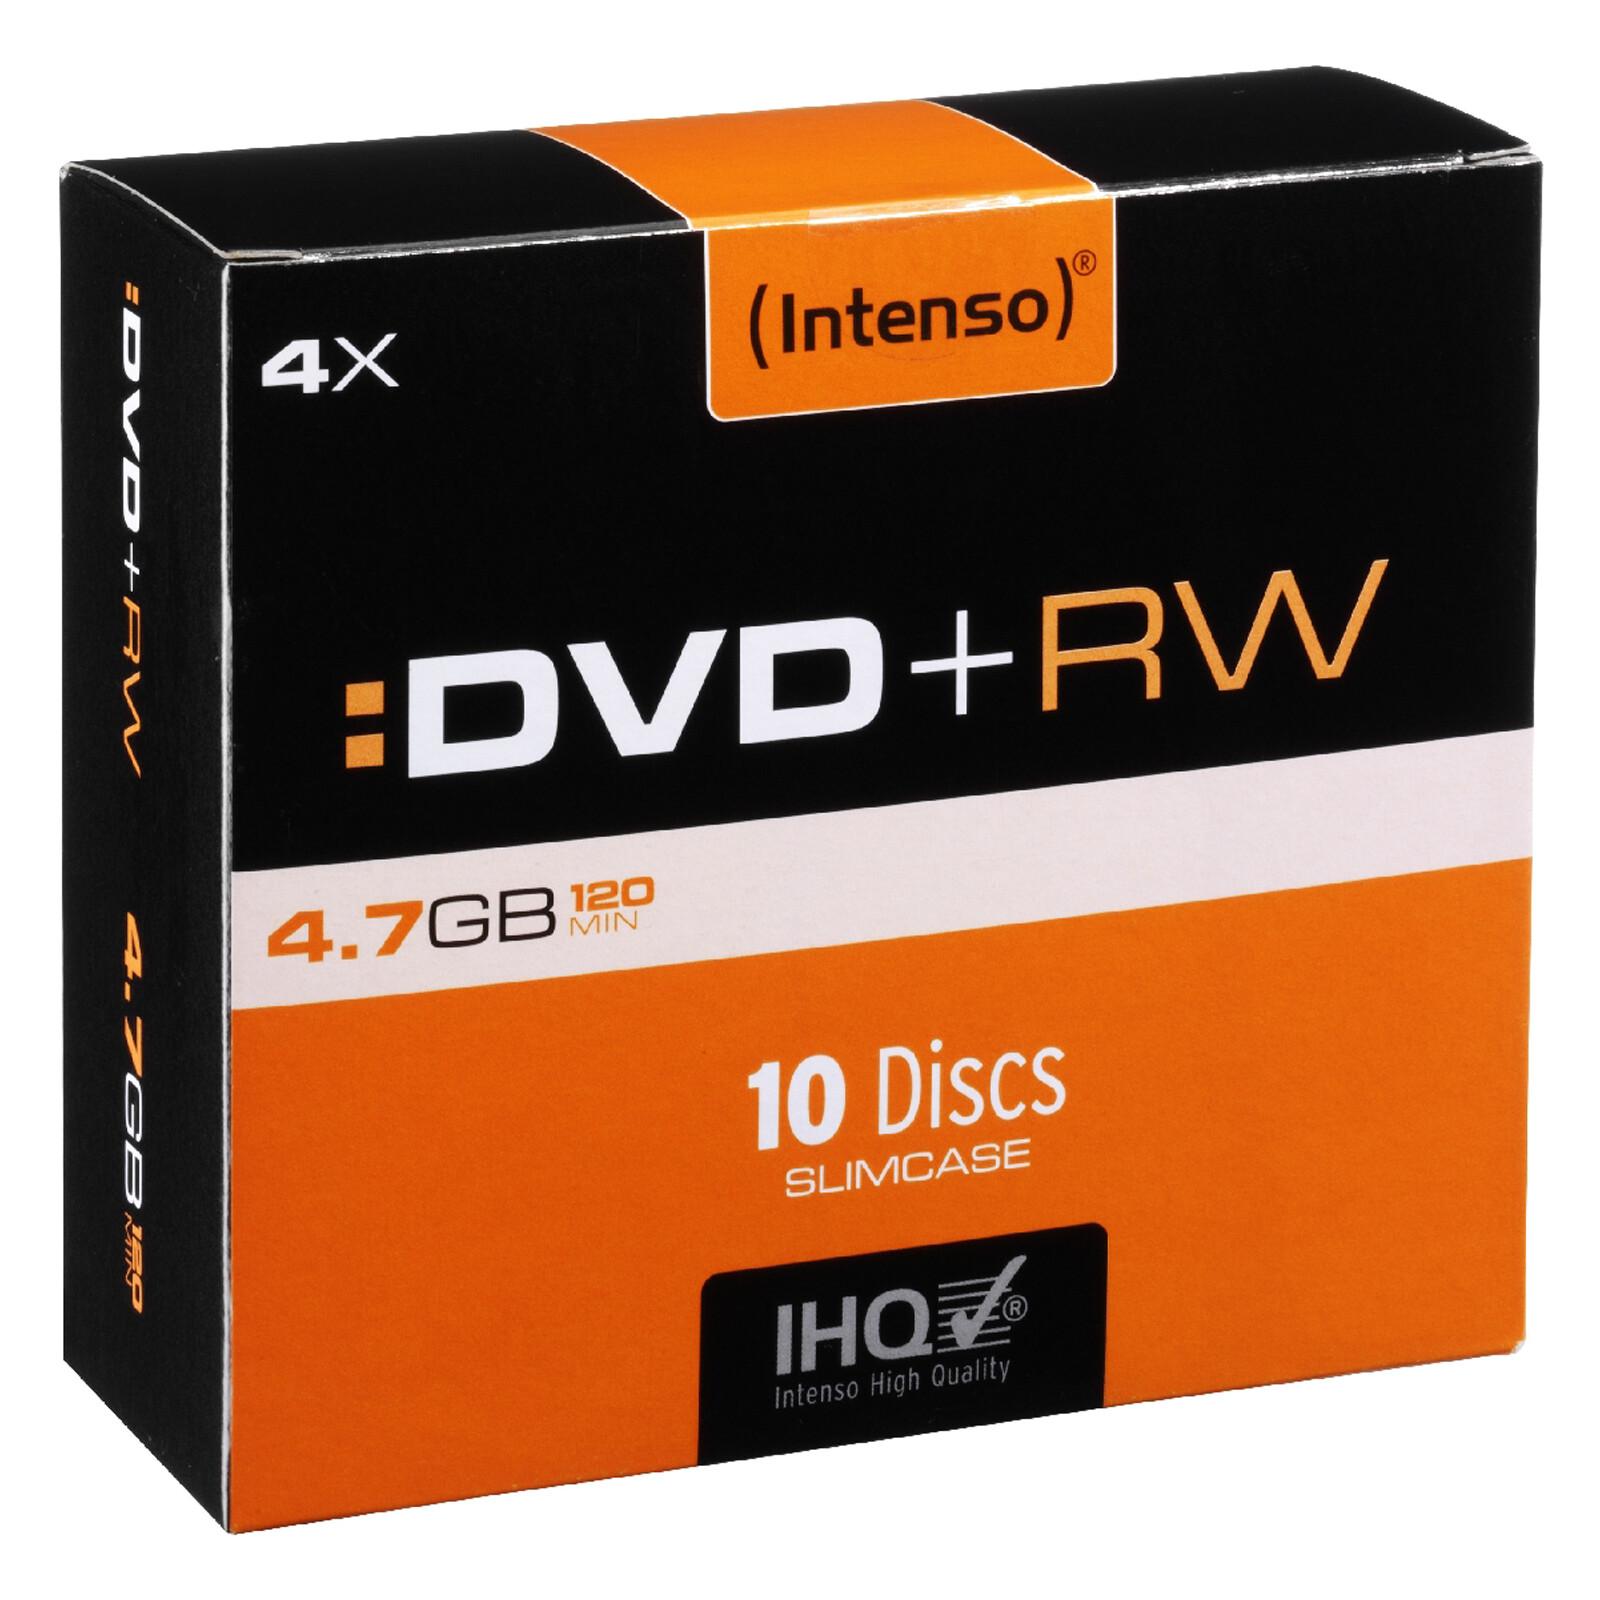 Intenso DVD+RW 4,7GB/4x Slim Case 10er